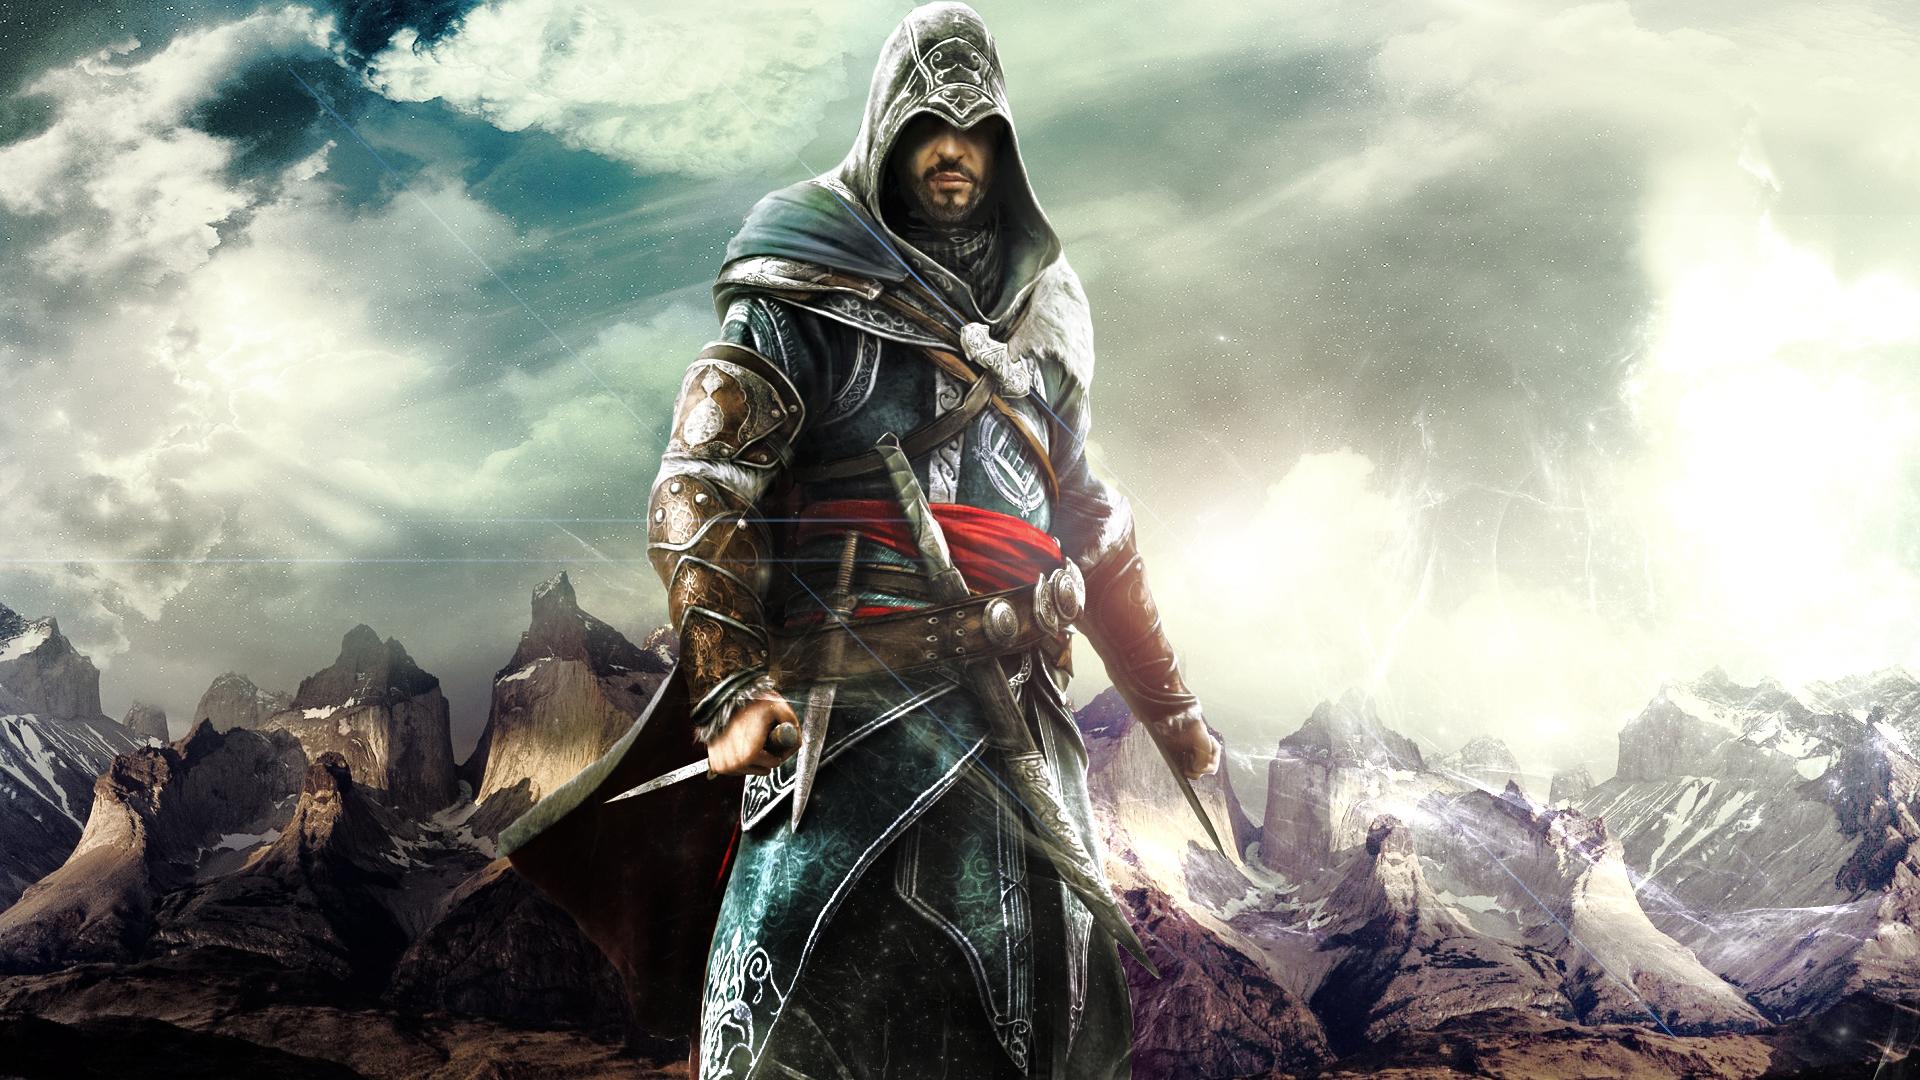 Assassins Creed Wallpaper 1080p: Assassin's Creed Wallpaper HD 1080p